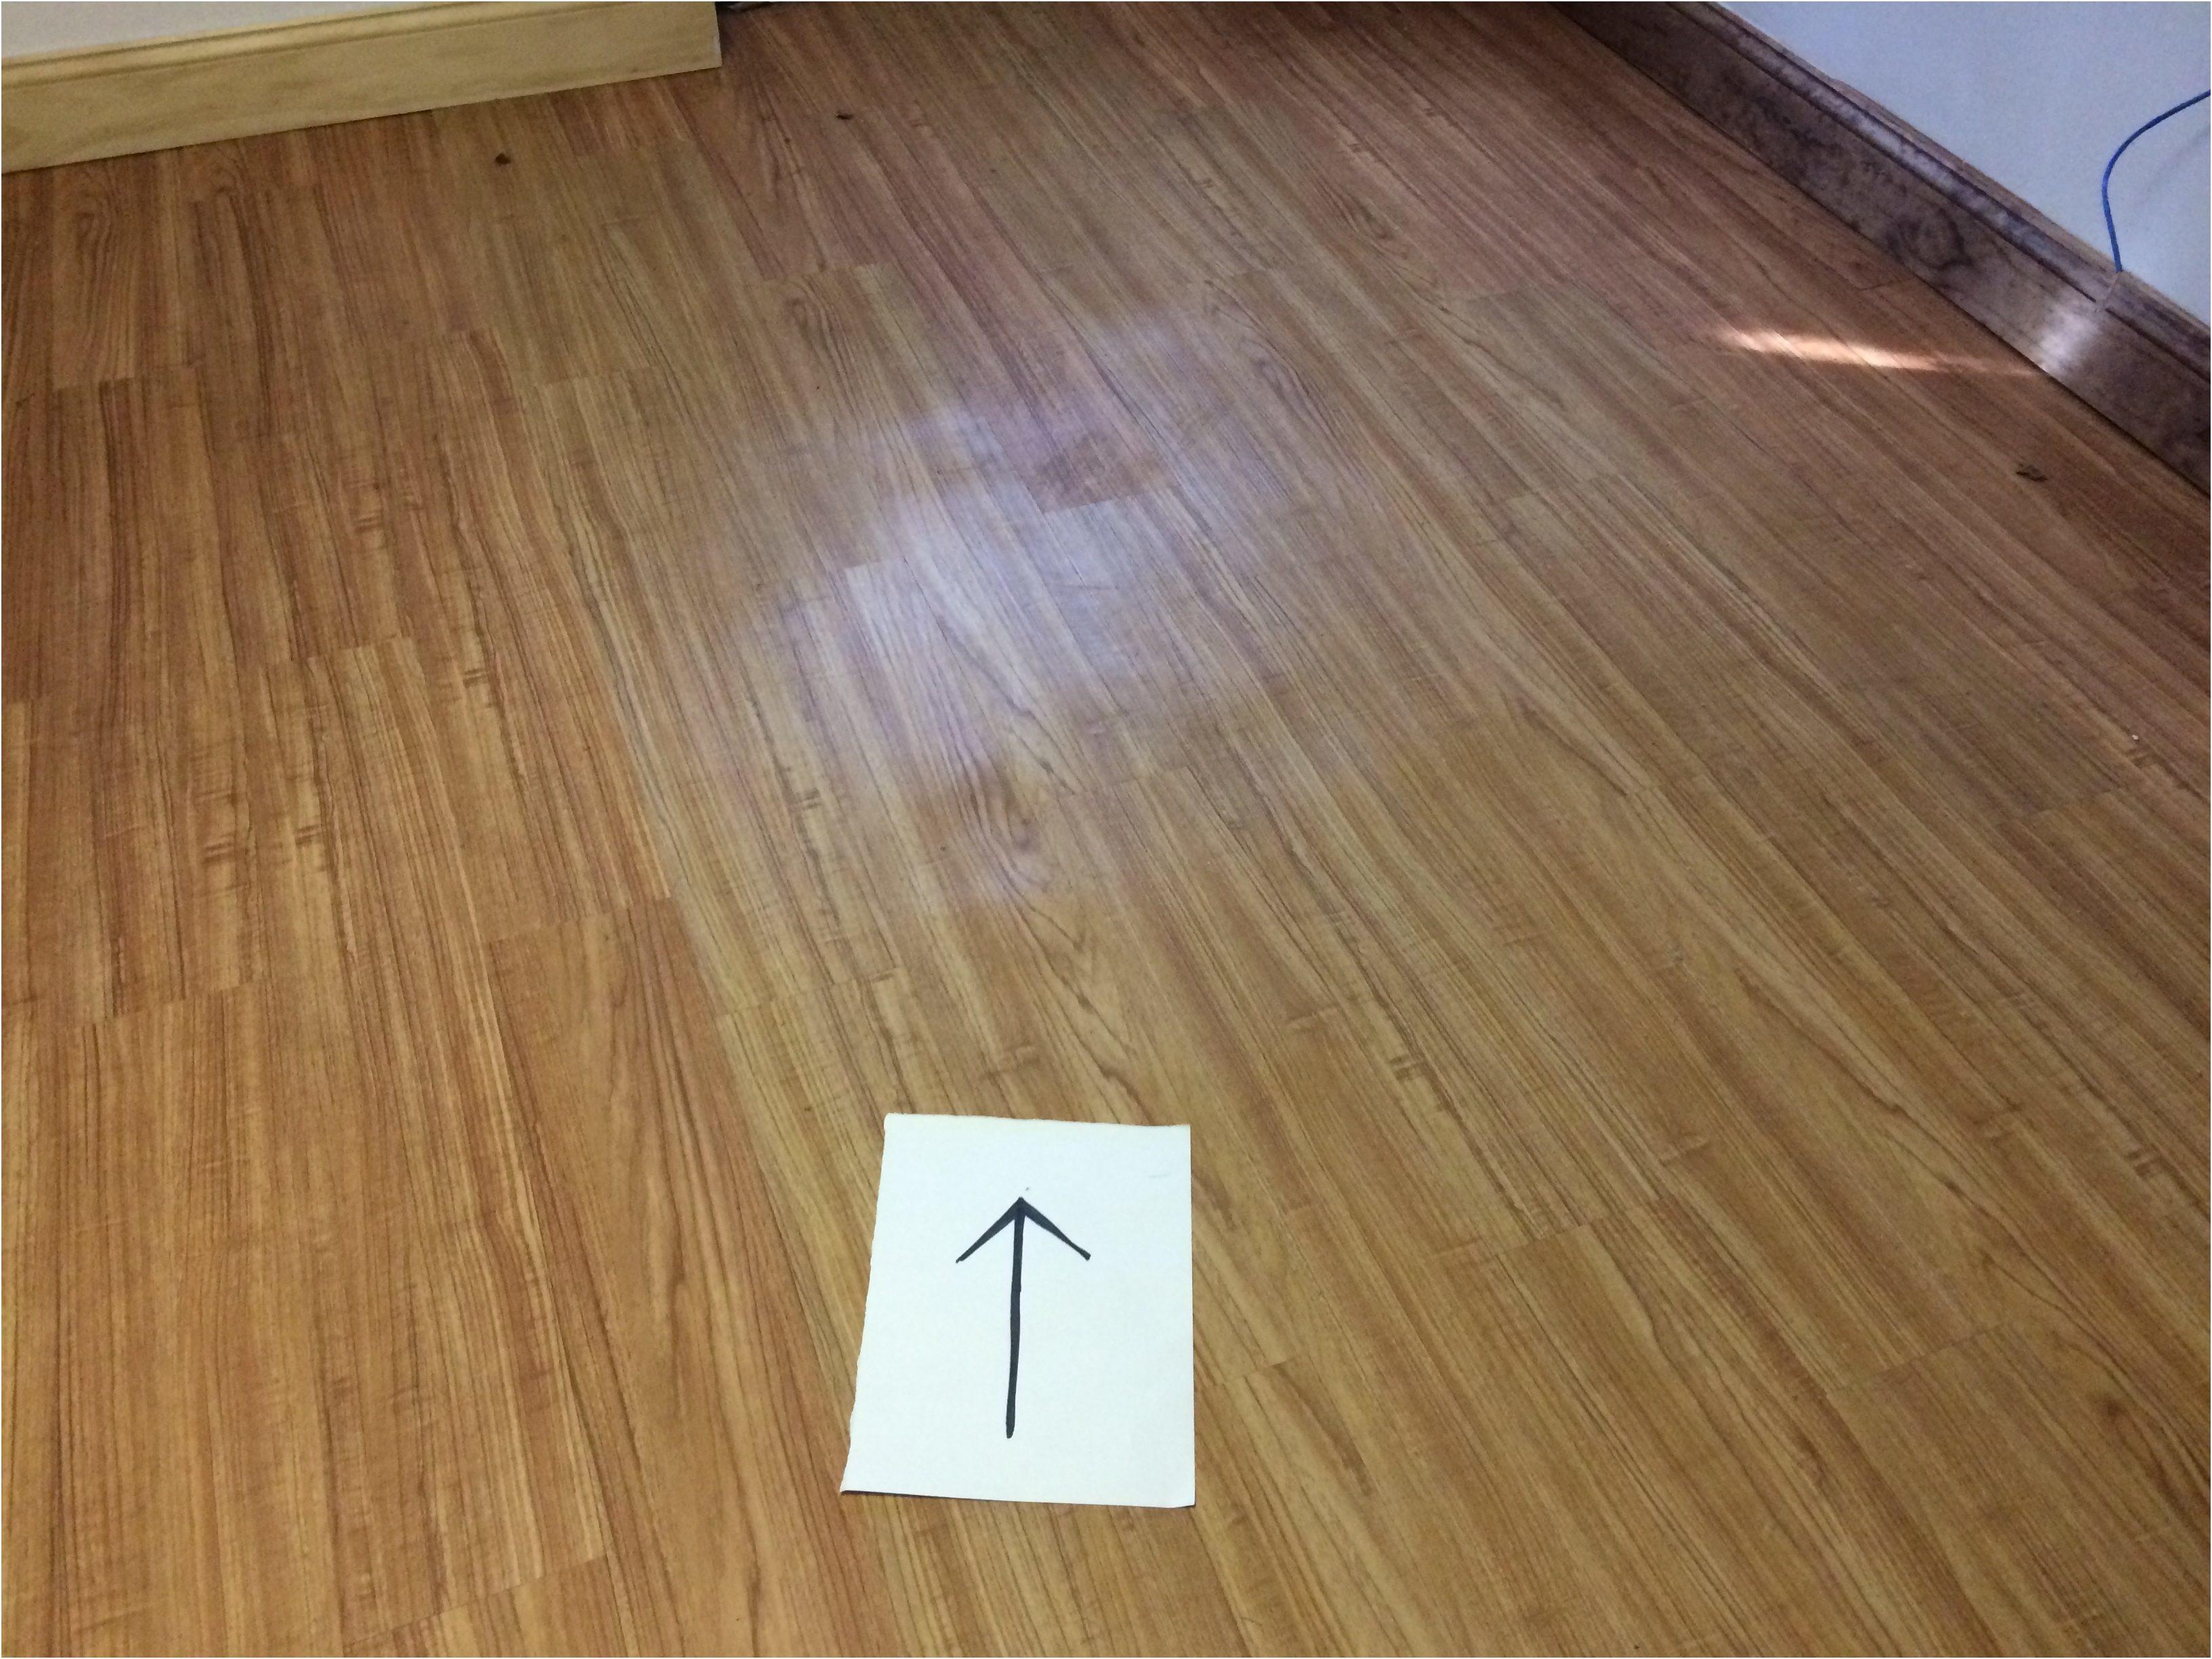 vinyl hardwood flooring home depot of home depot allure vinyl plank flooring elegant elegant home depot with regard to home depot allure vinyl plank flooring elegant elegant home depot carpet and installation